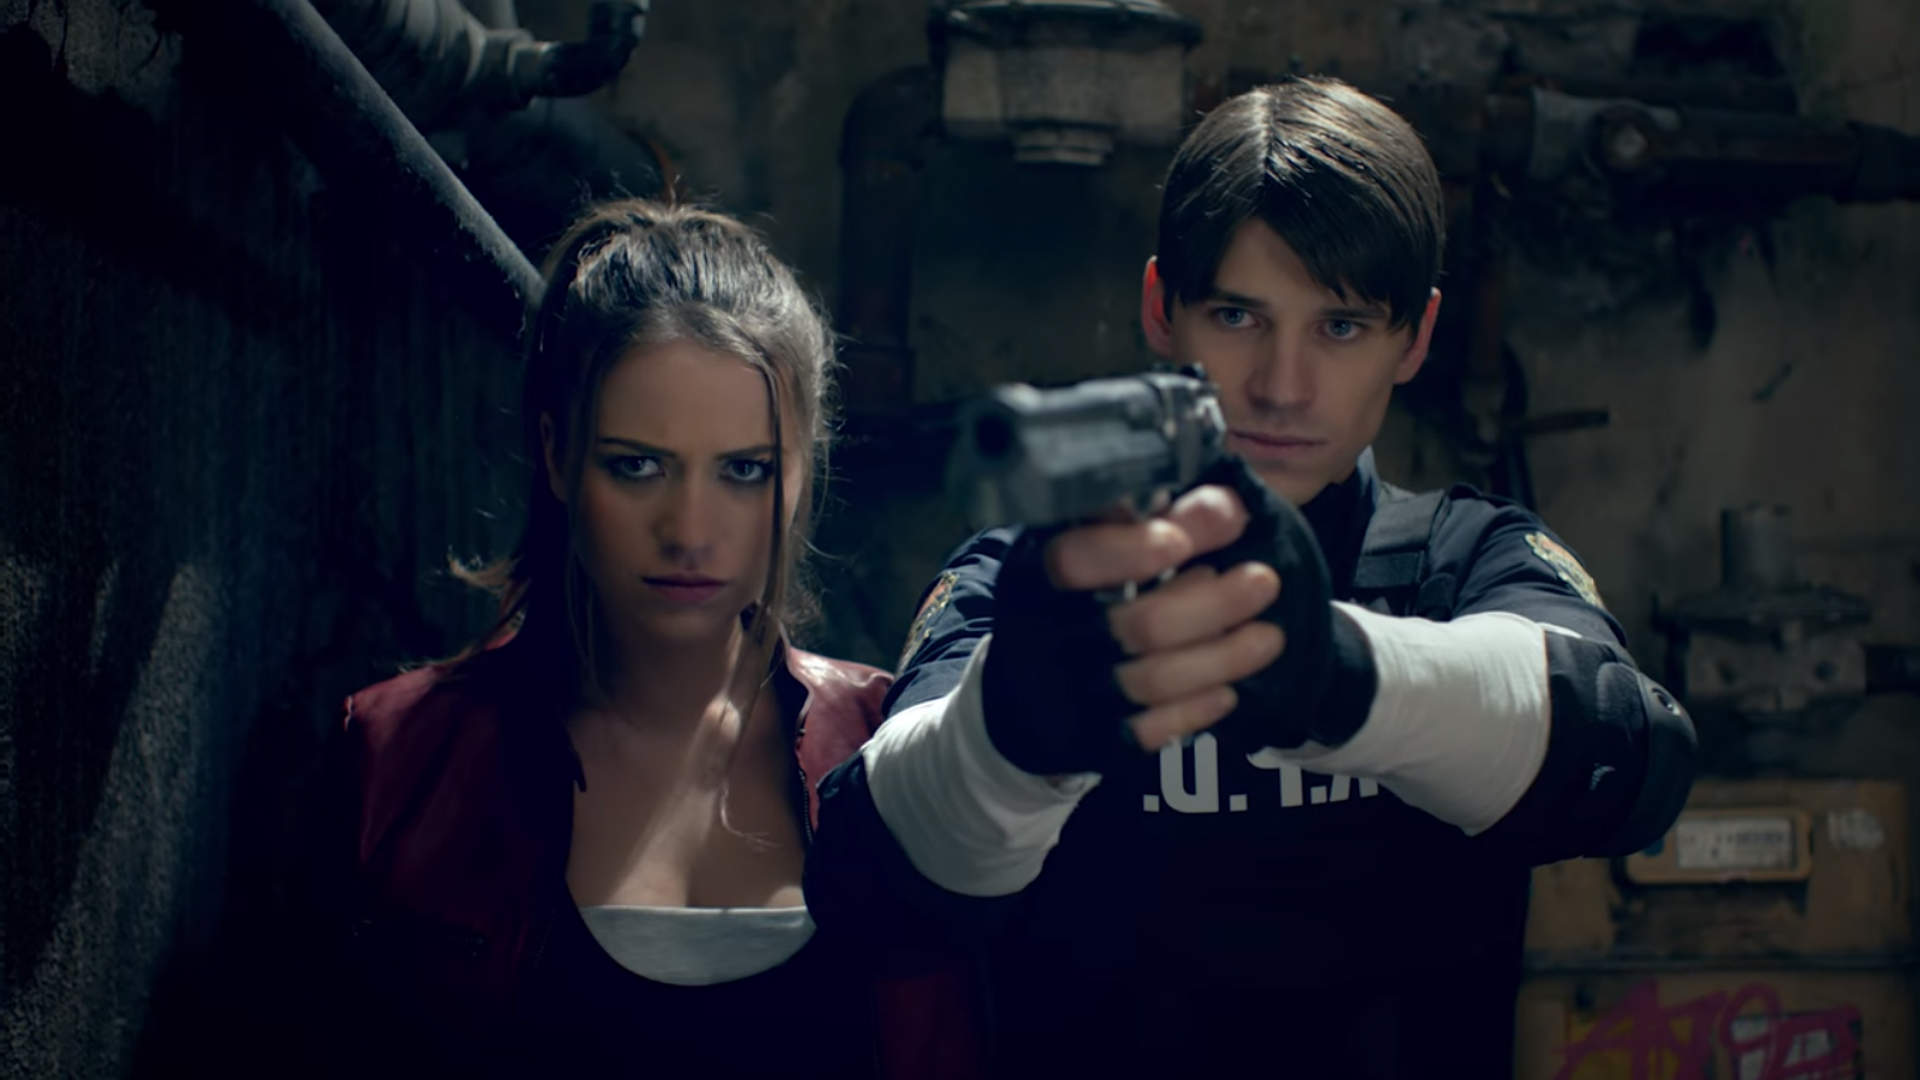 Resident Evil TV Show Featuring Wesker Kids Confirmed For Netflix